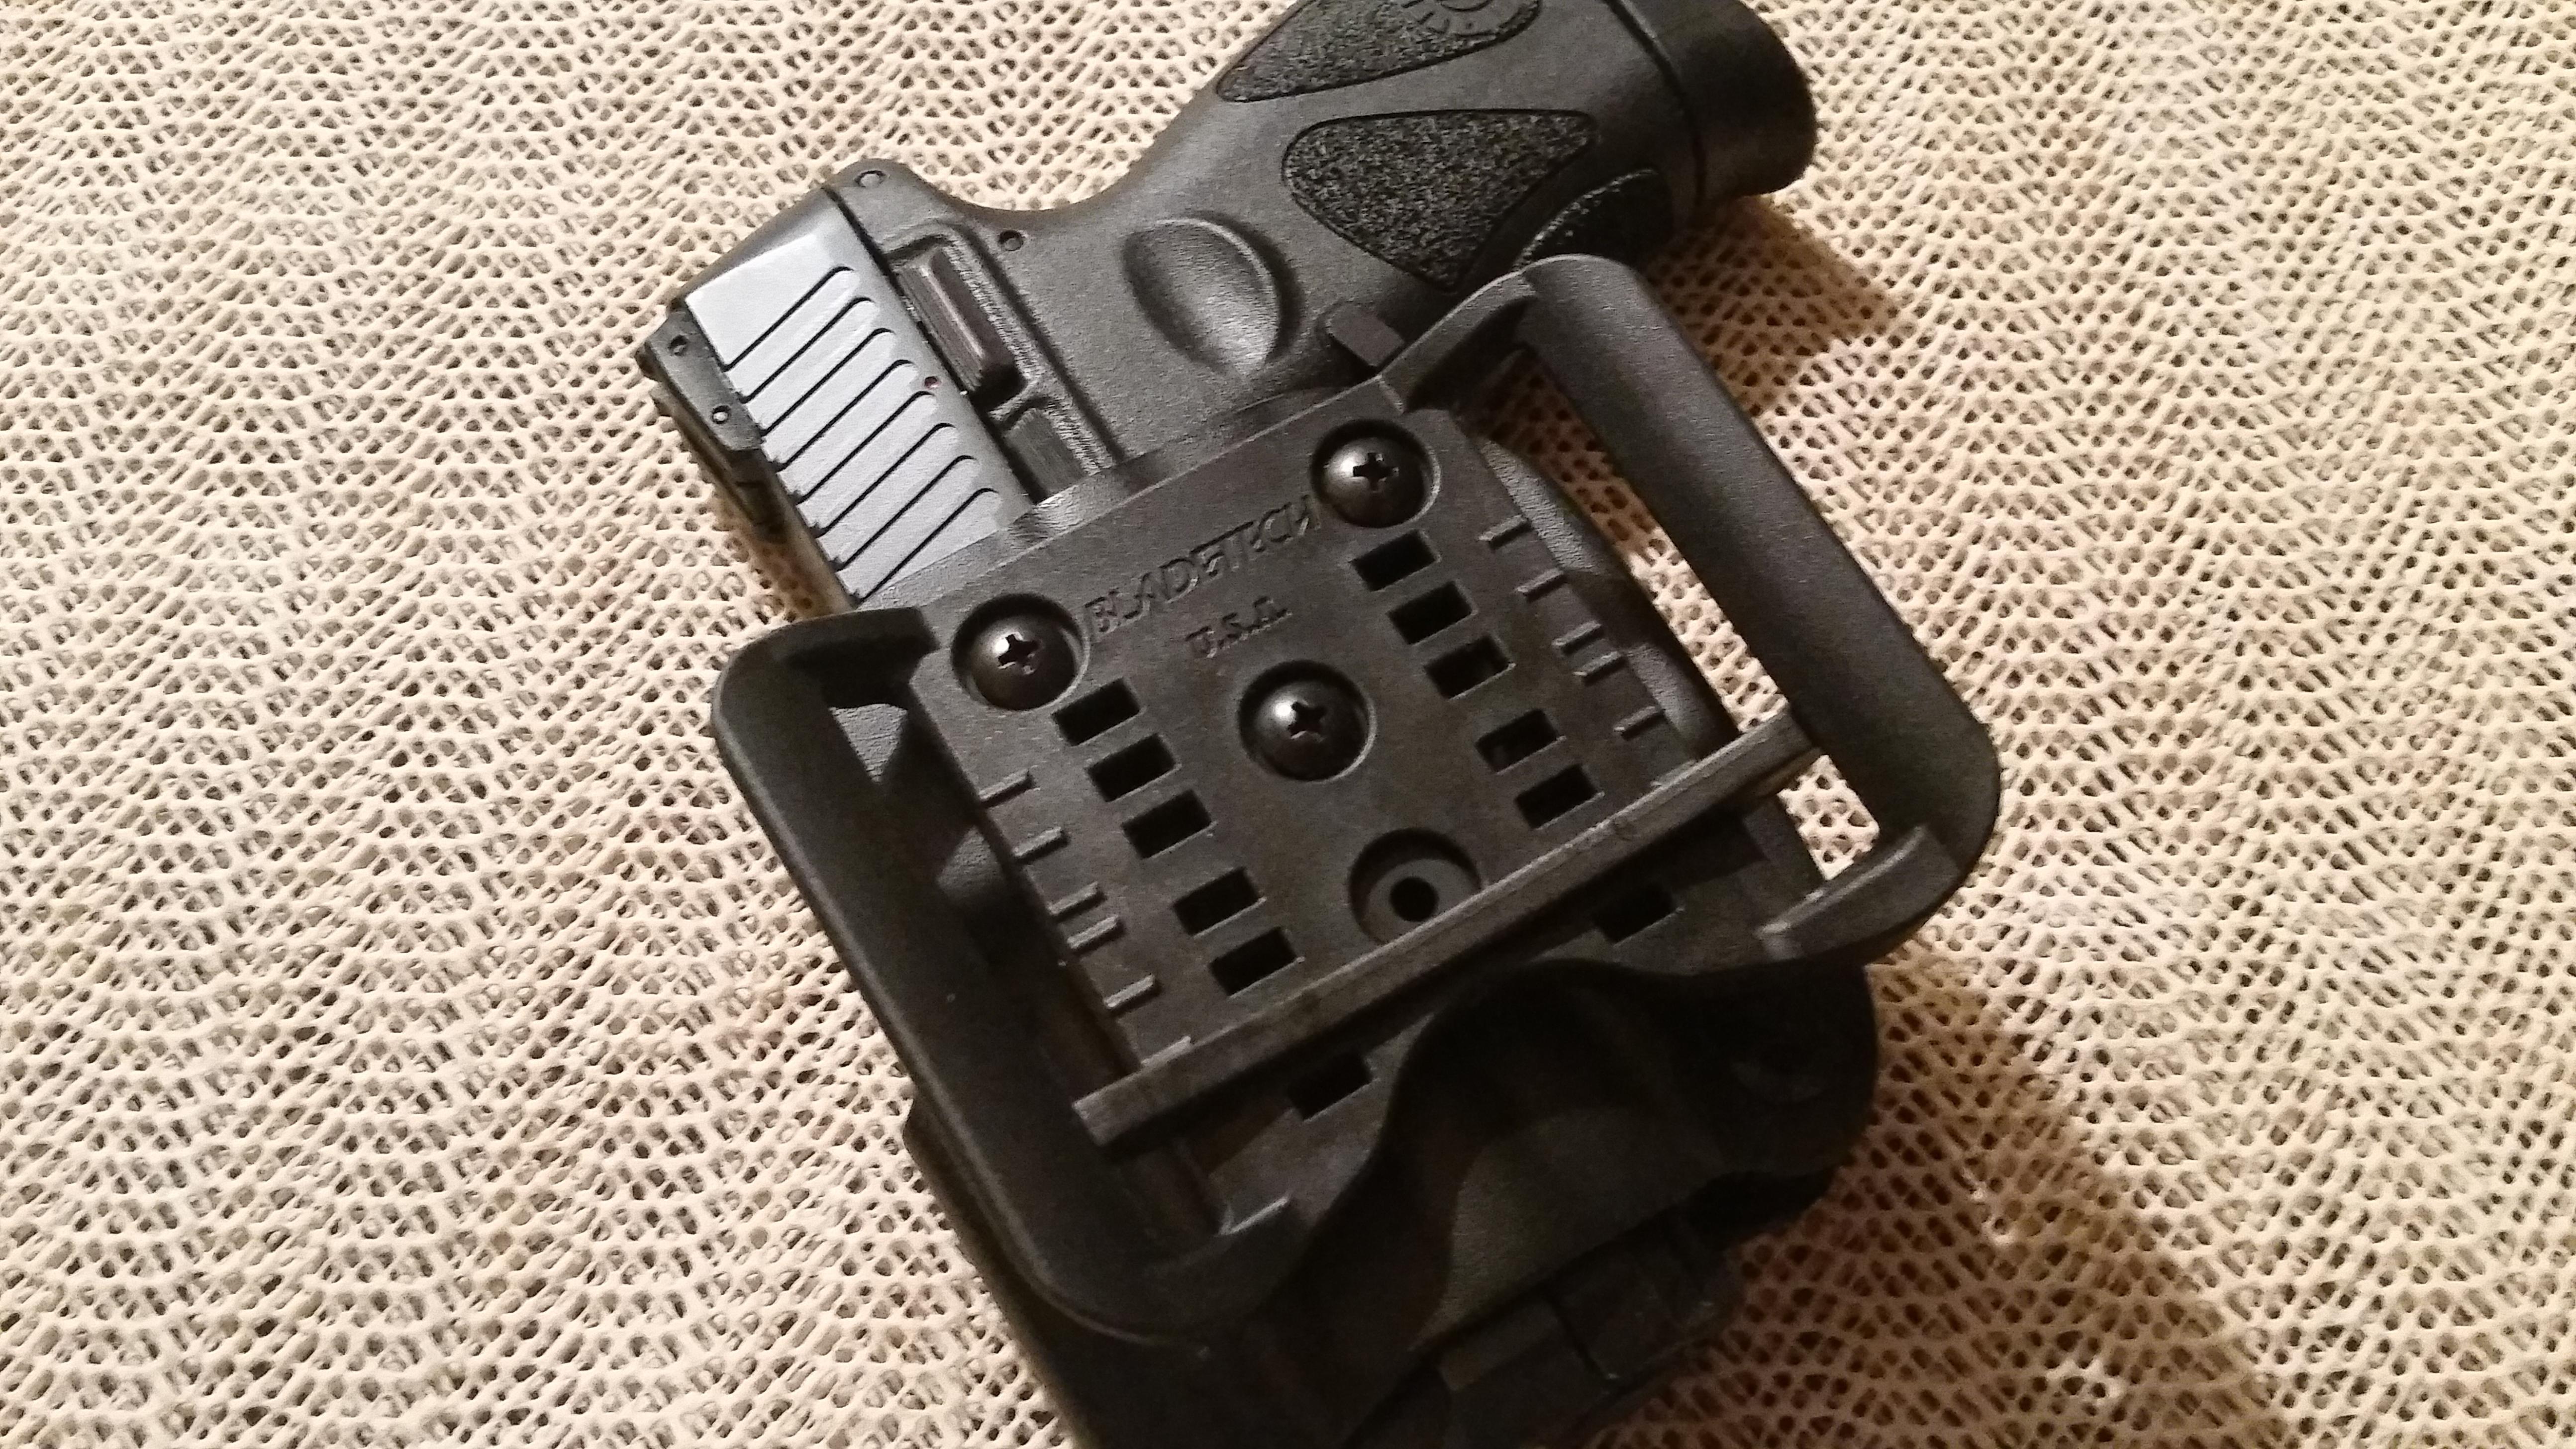 pt111 holster size codes